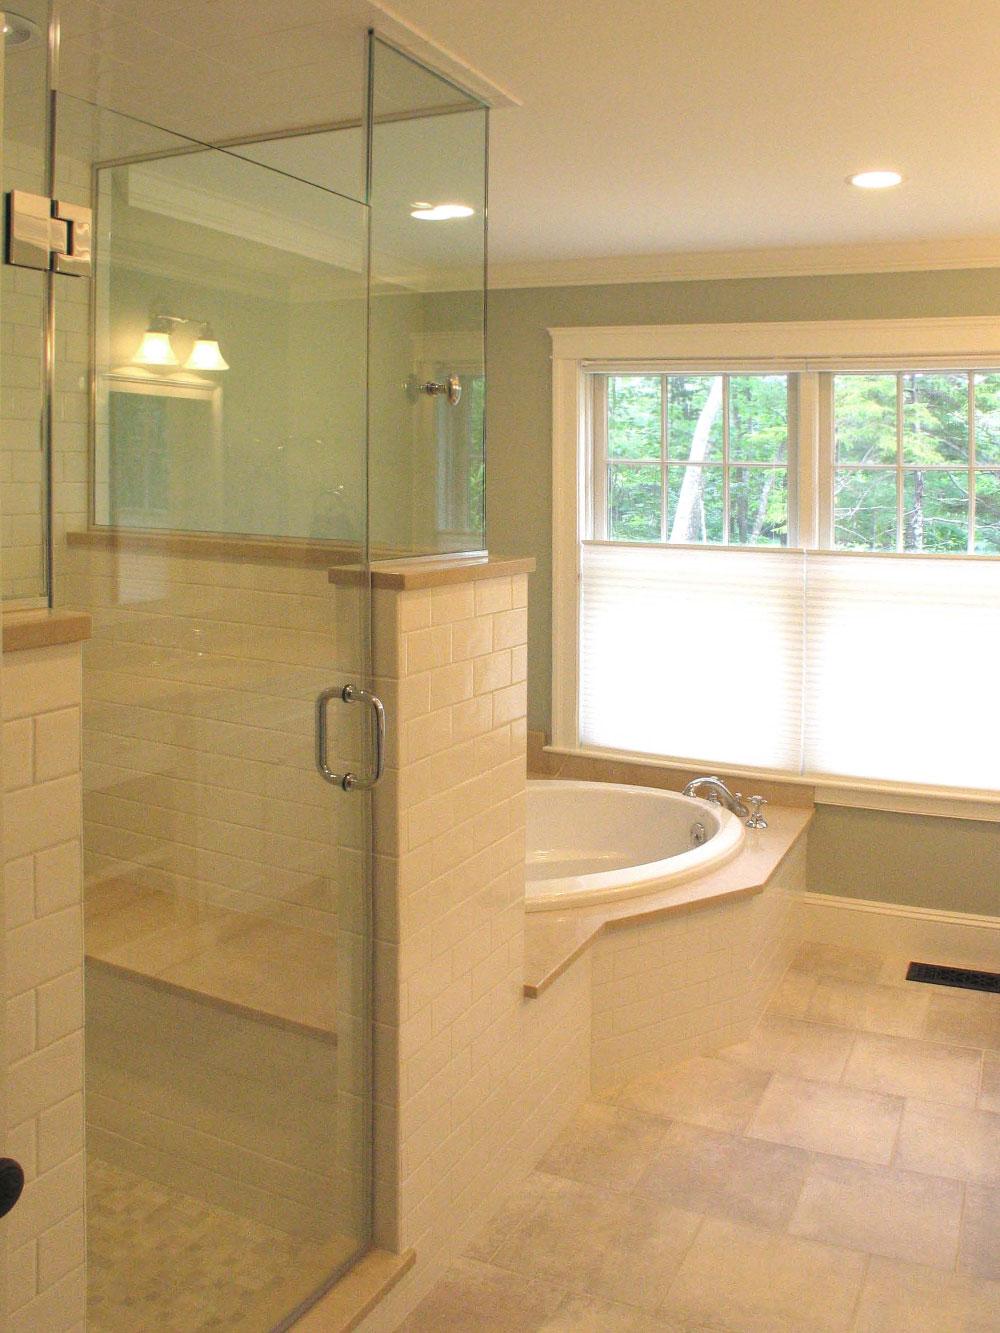 Bathrooms-Shower-Tub